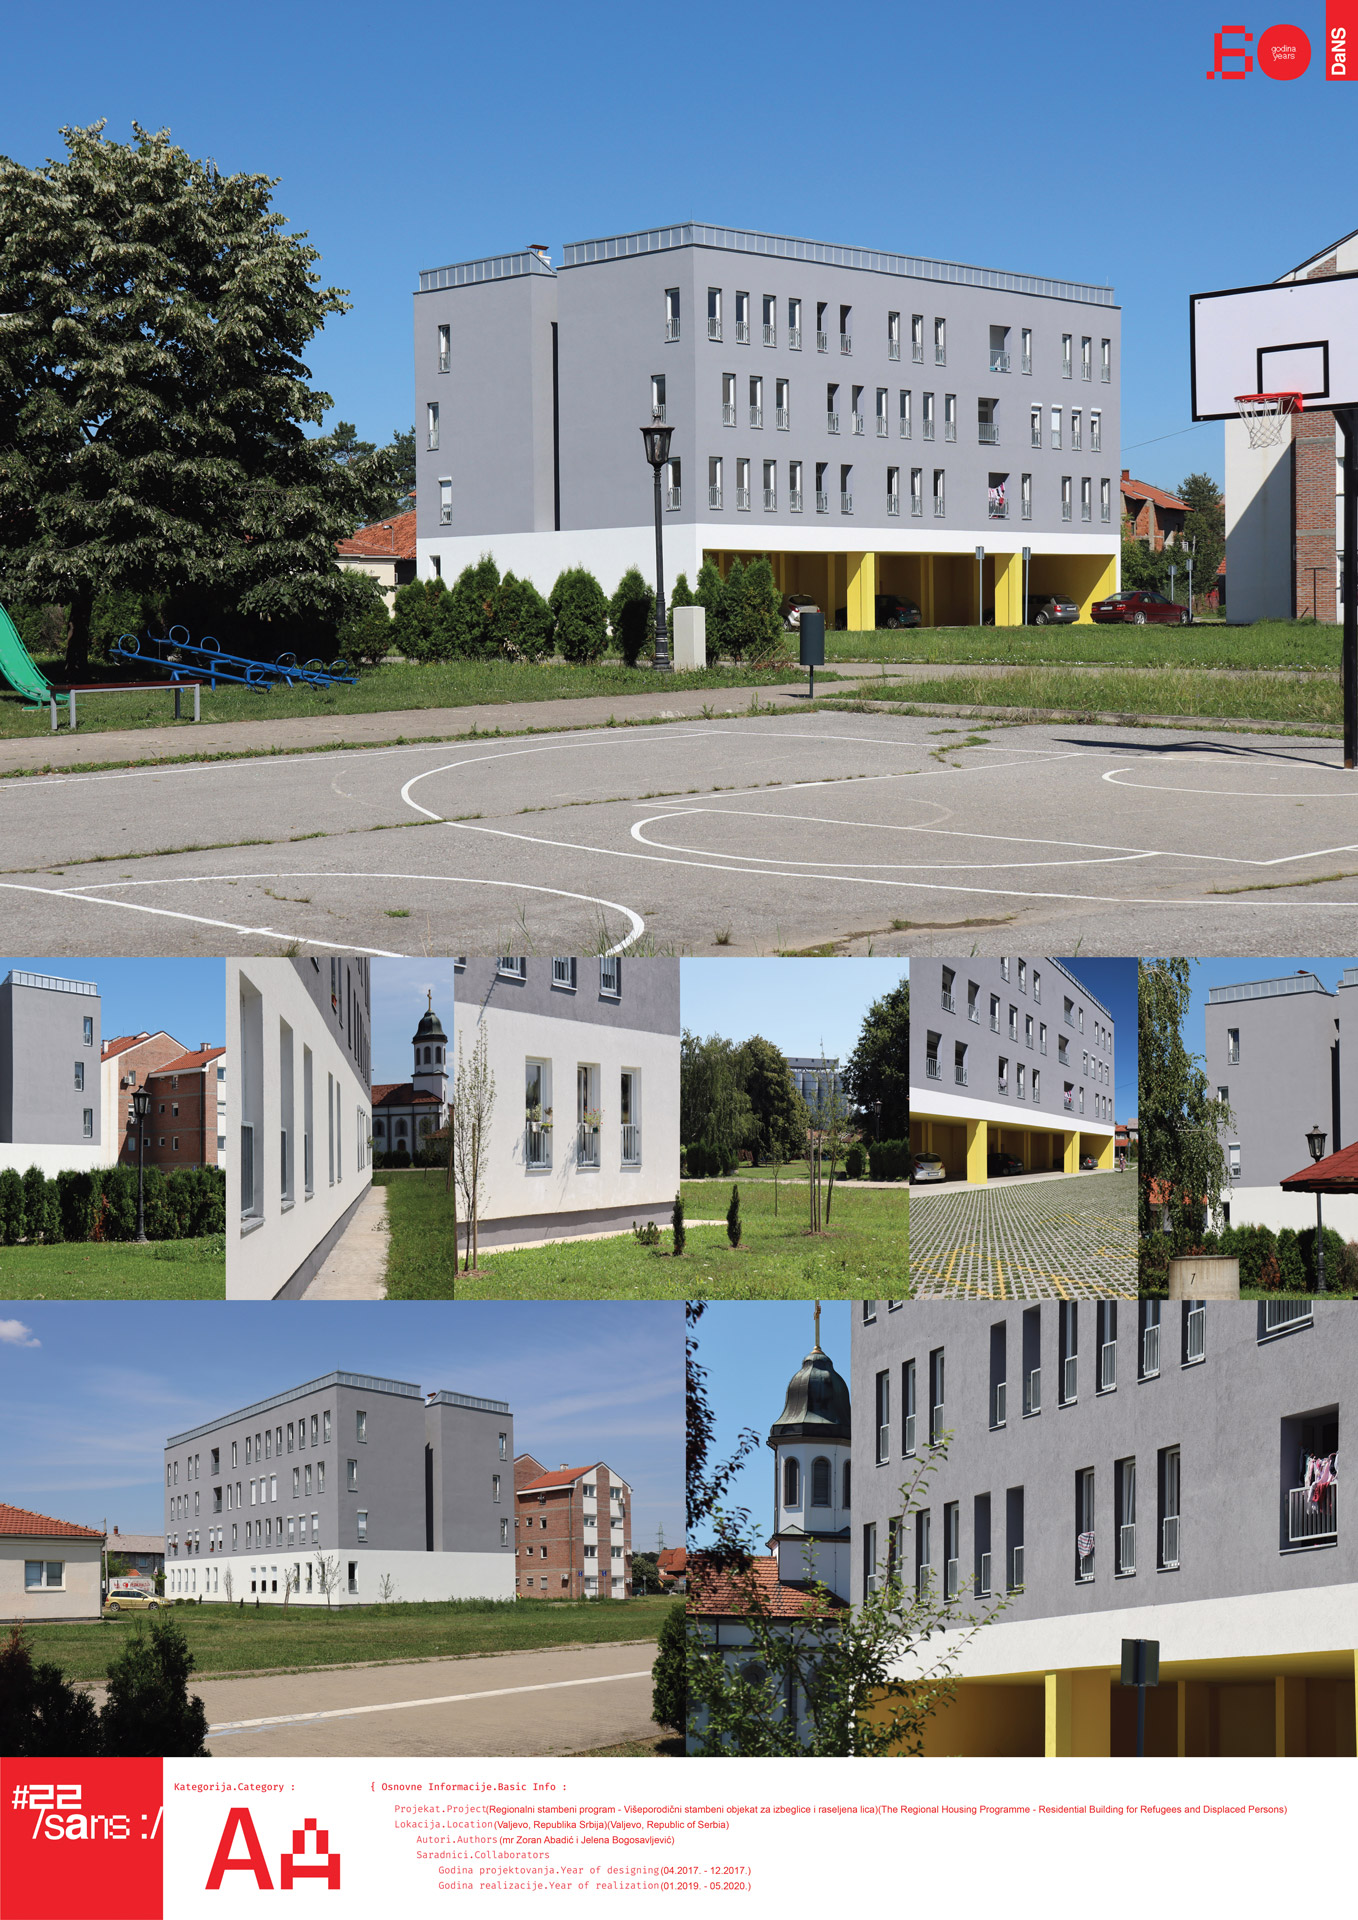 "<p class=""naslov-br"">aa12</p>Višeporodični stambeni objekat za izbeglice i raseljena lica // The Regional Housing Programme – Residental Building for Refugees and Displaced Persons"